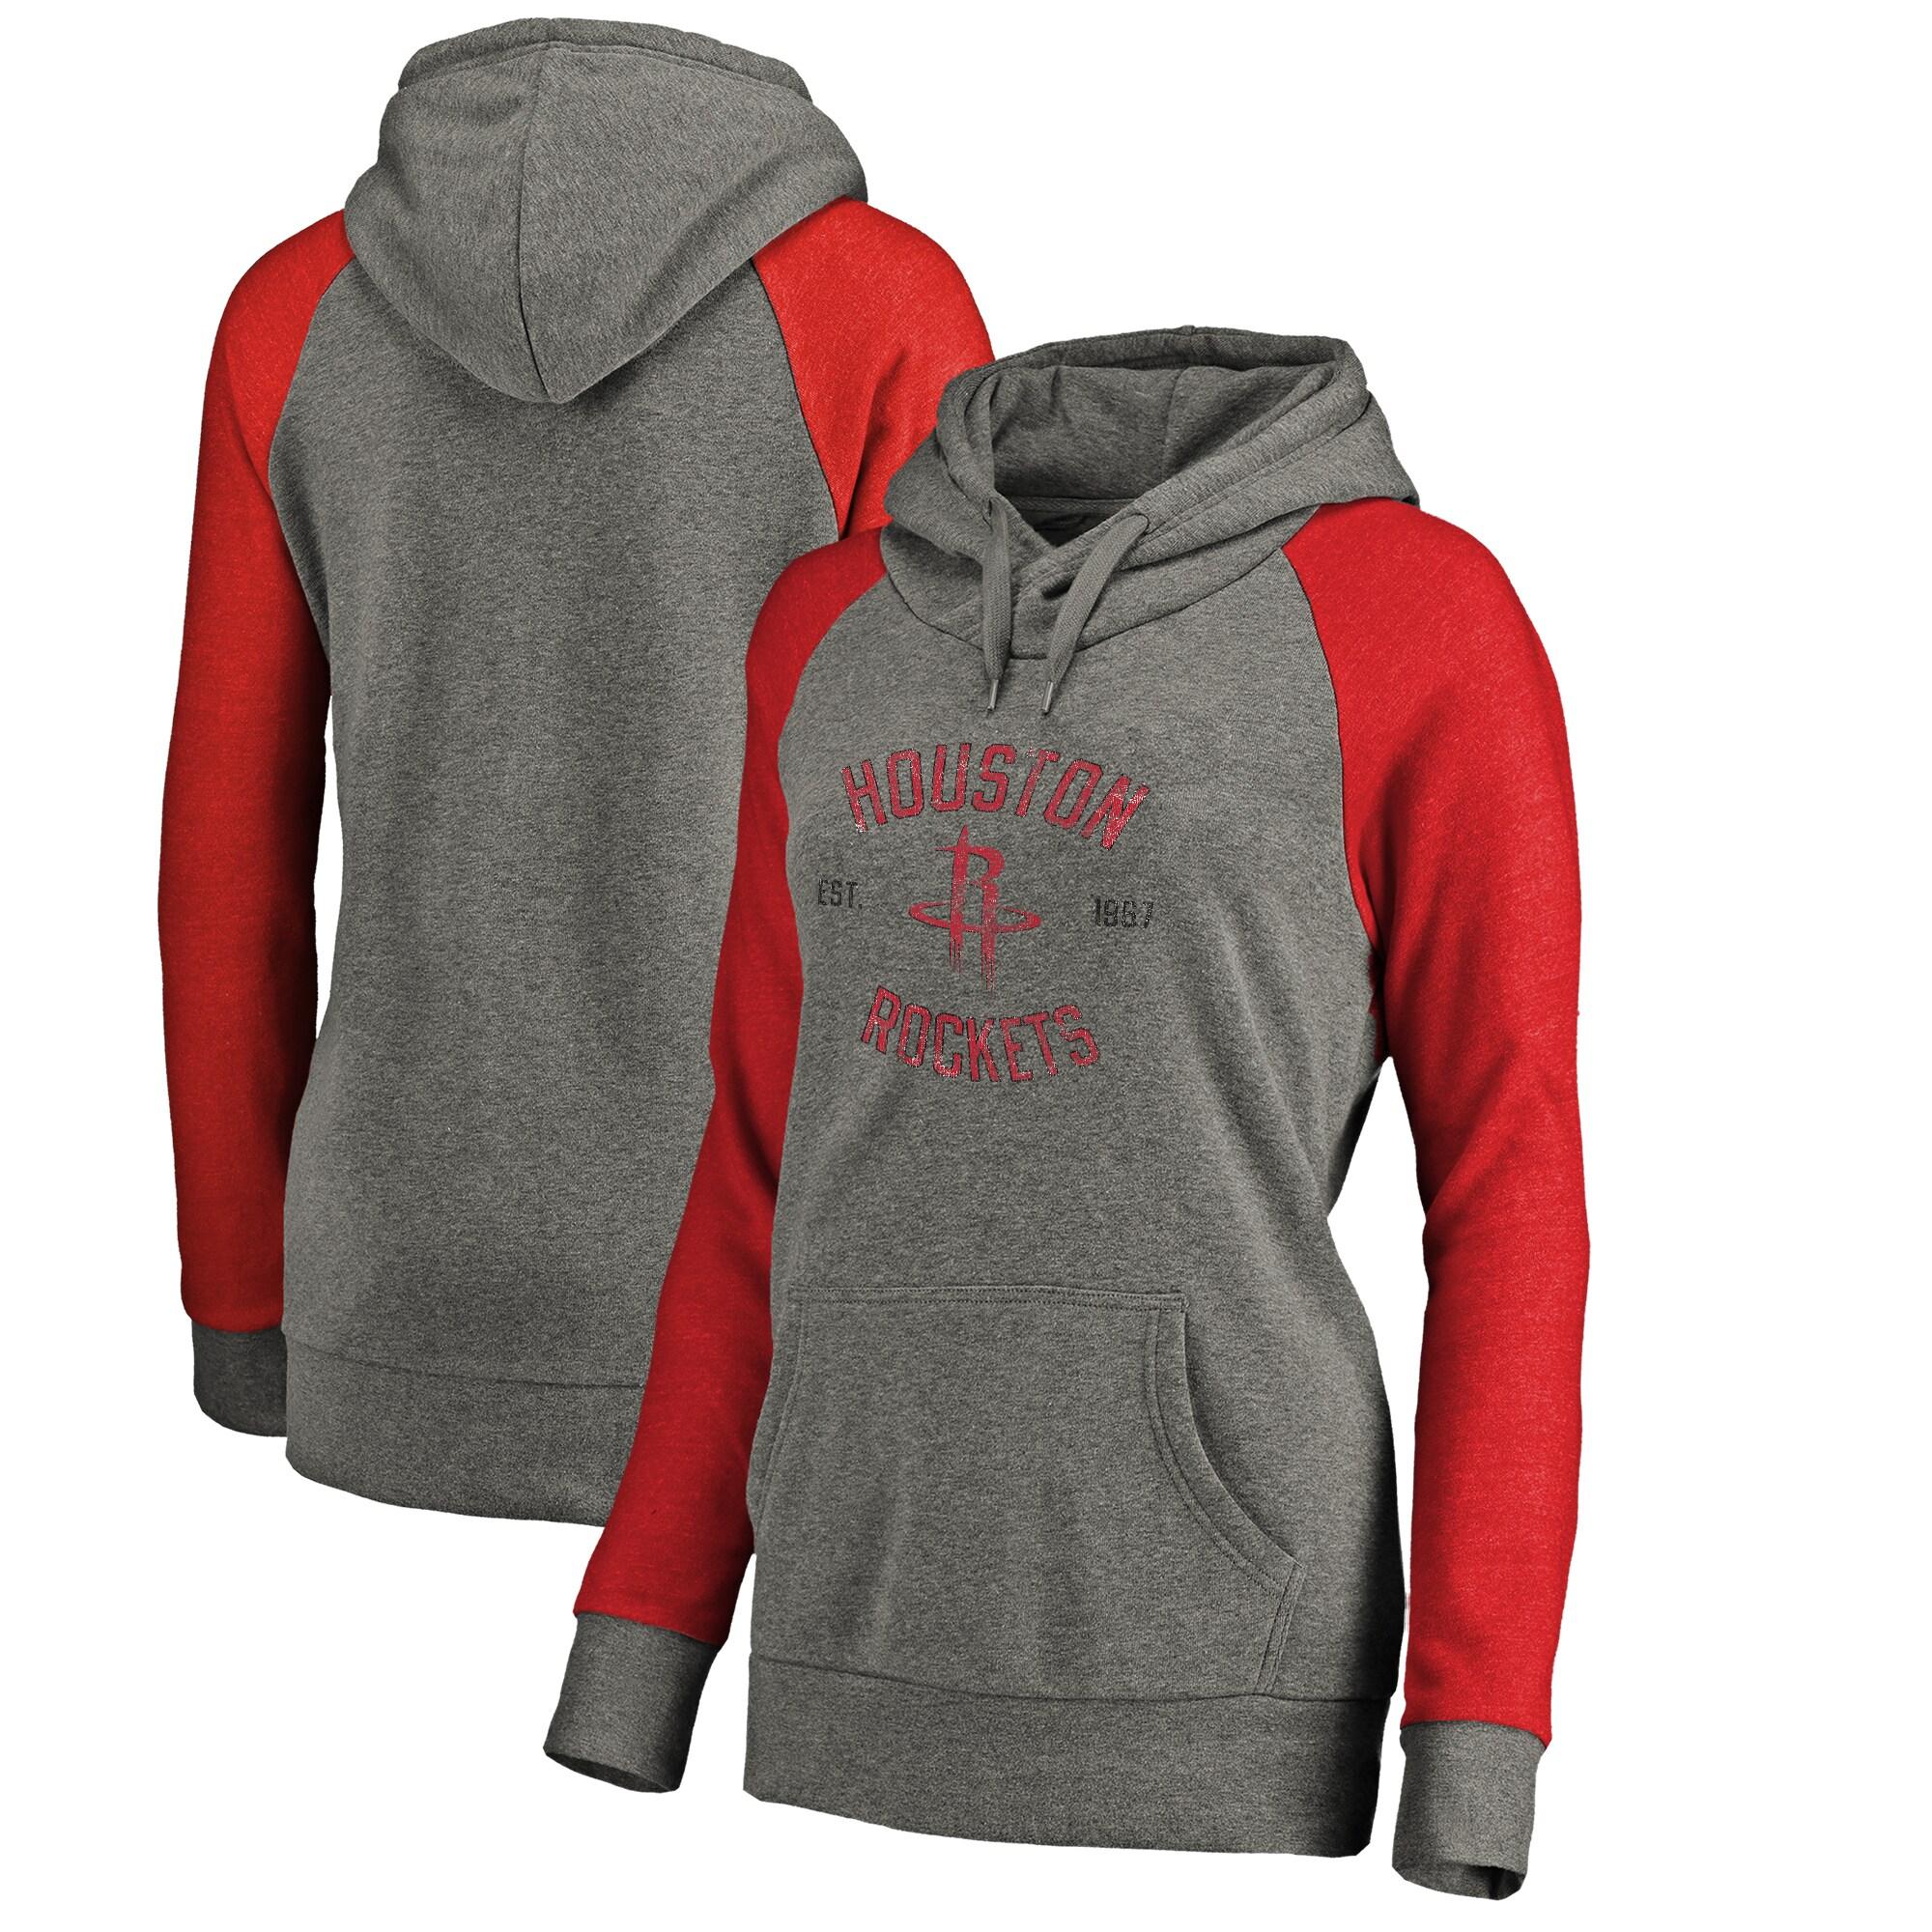 Houston Rockets Fanatics Branded Women's Heritage Tri-Blend Raglan Plus Size Pullover Hoodie - Heathered Gray